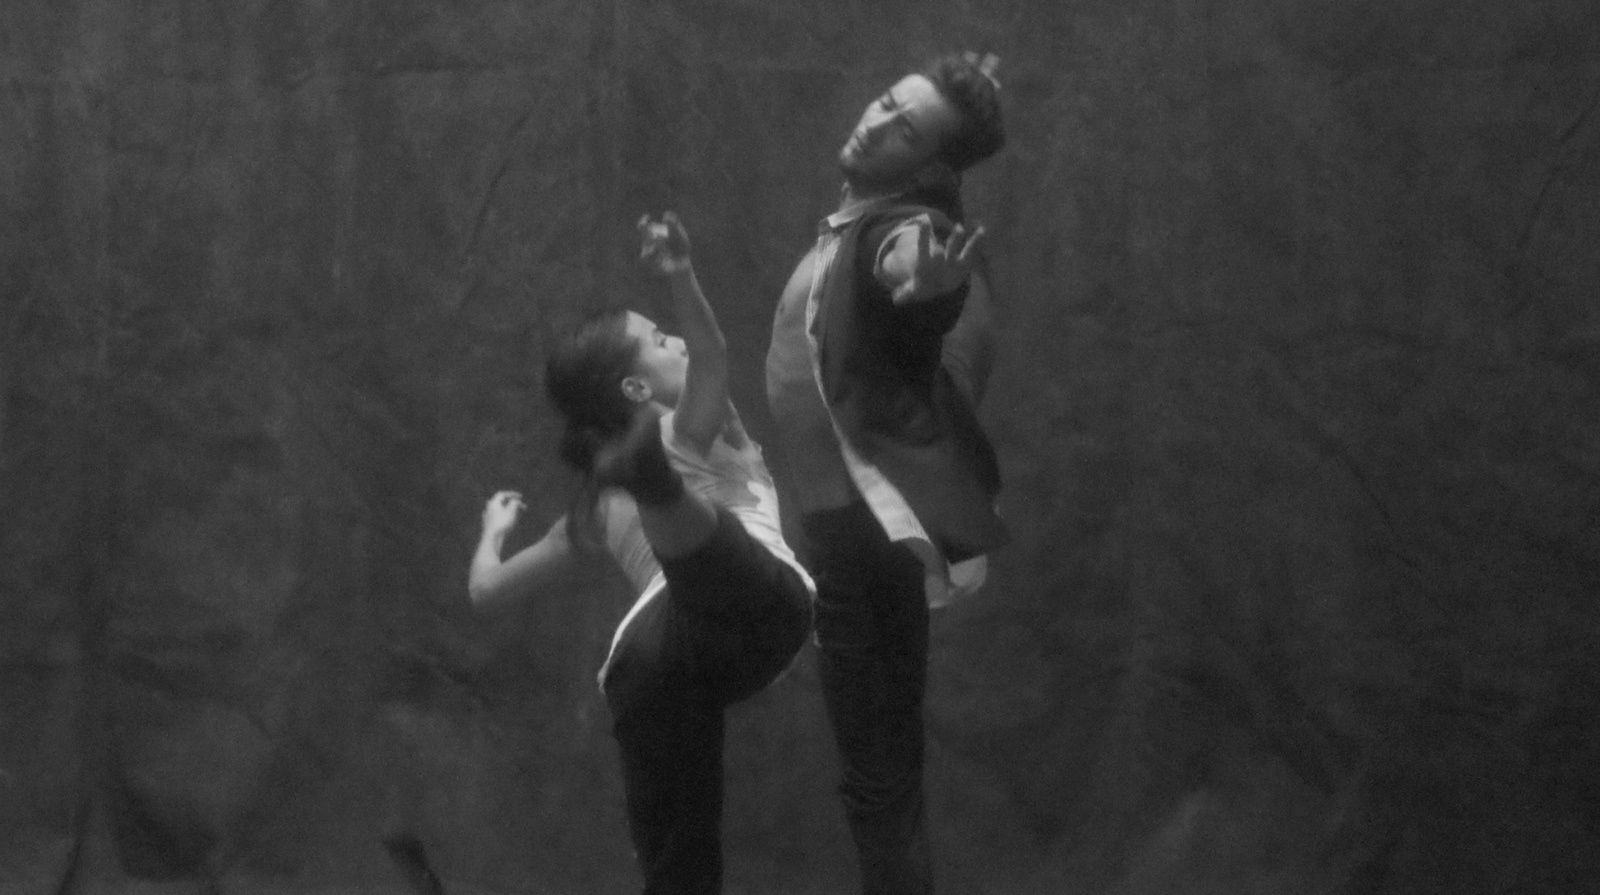 Le Mandarin Merveilleux Photo de r+®p+®tition -® Arnaud Hussenot - Metz M+®tropole